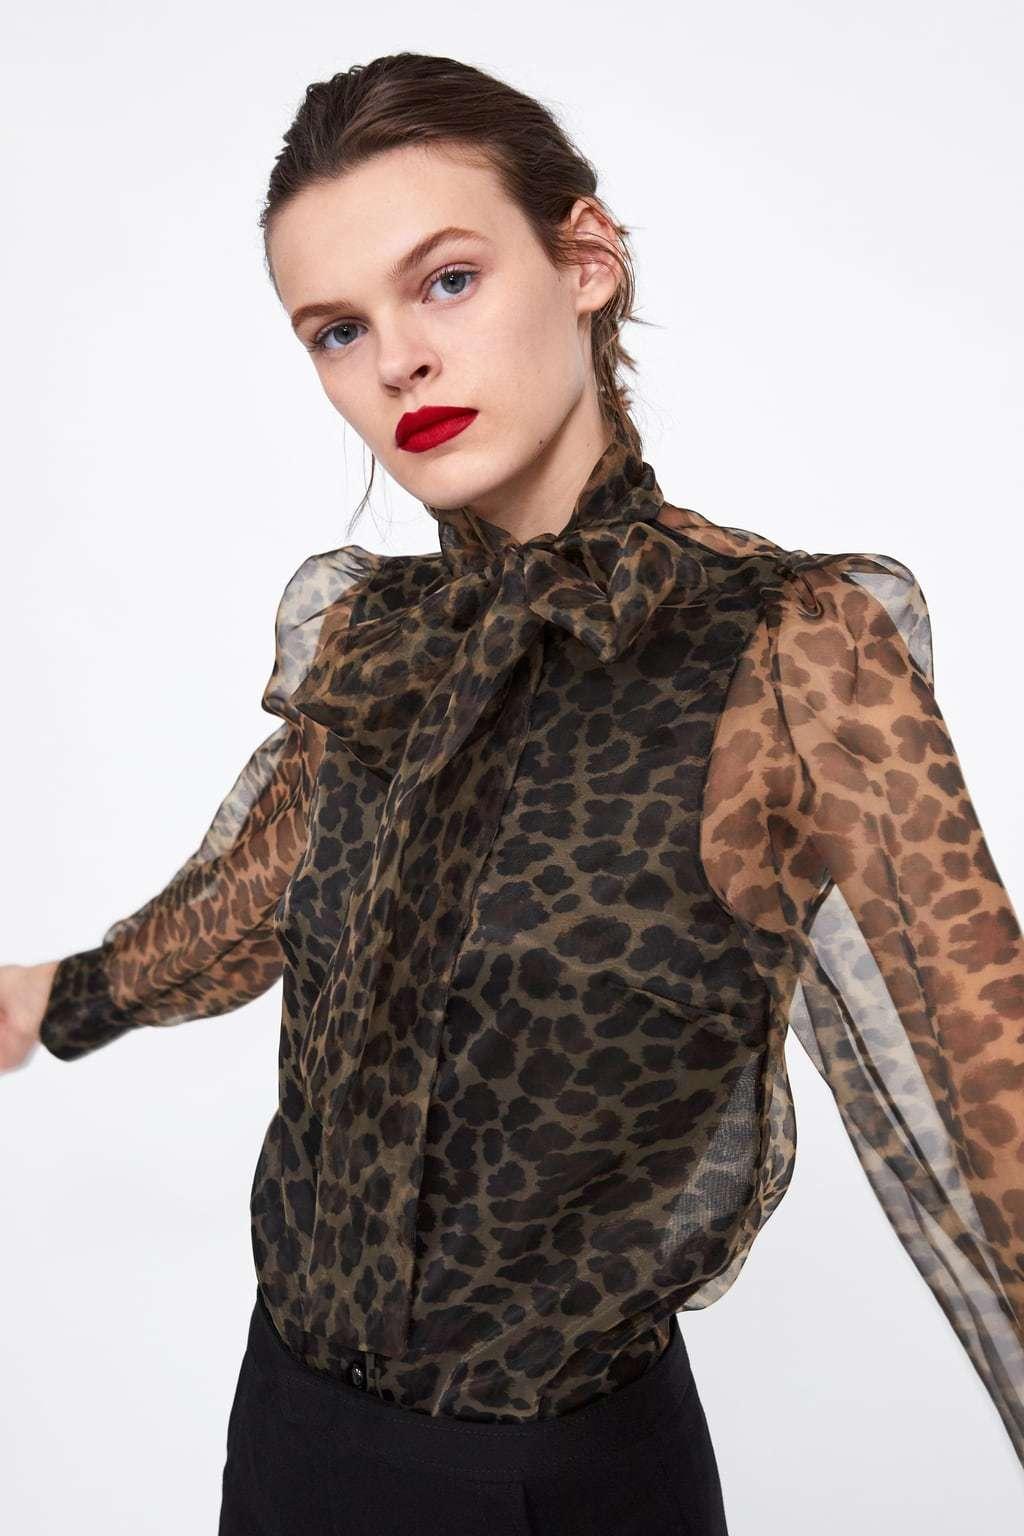 Blusa de estampado de leopardo (39,95 euros).